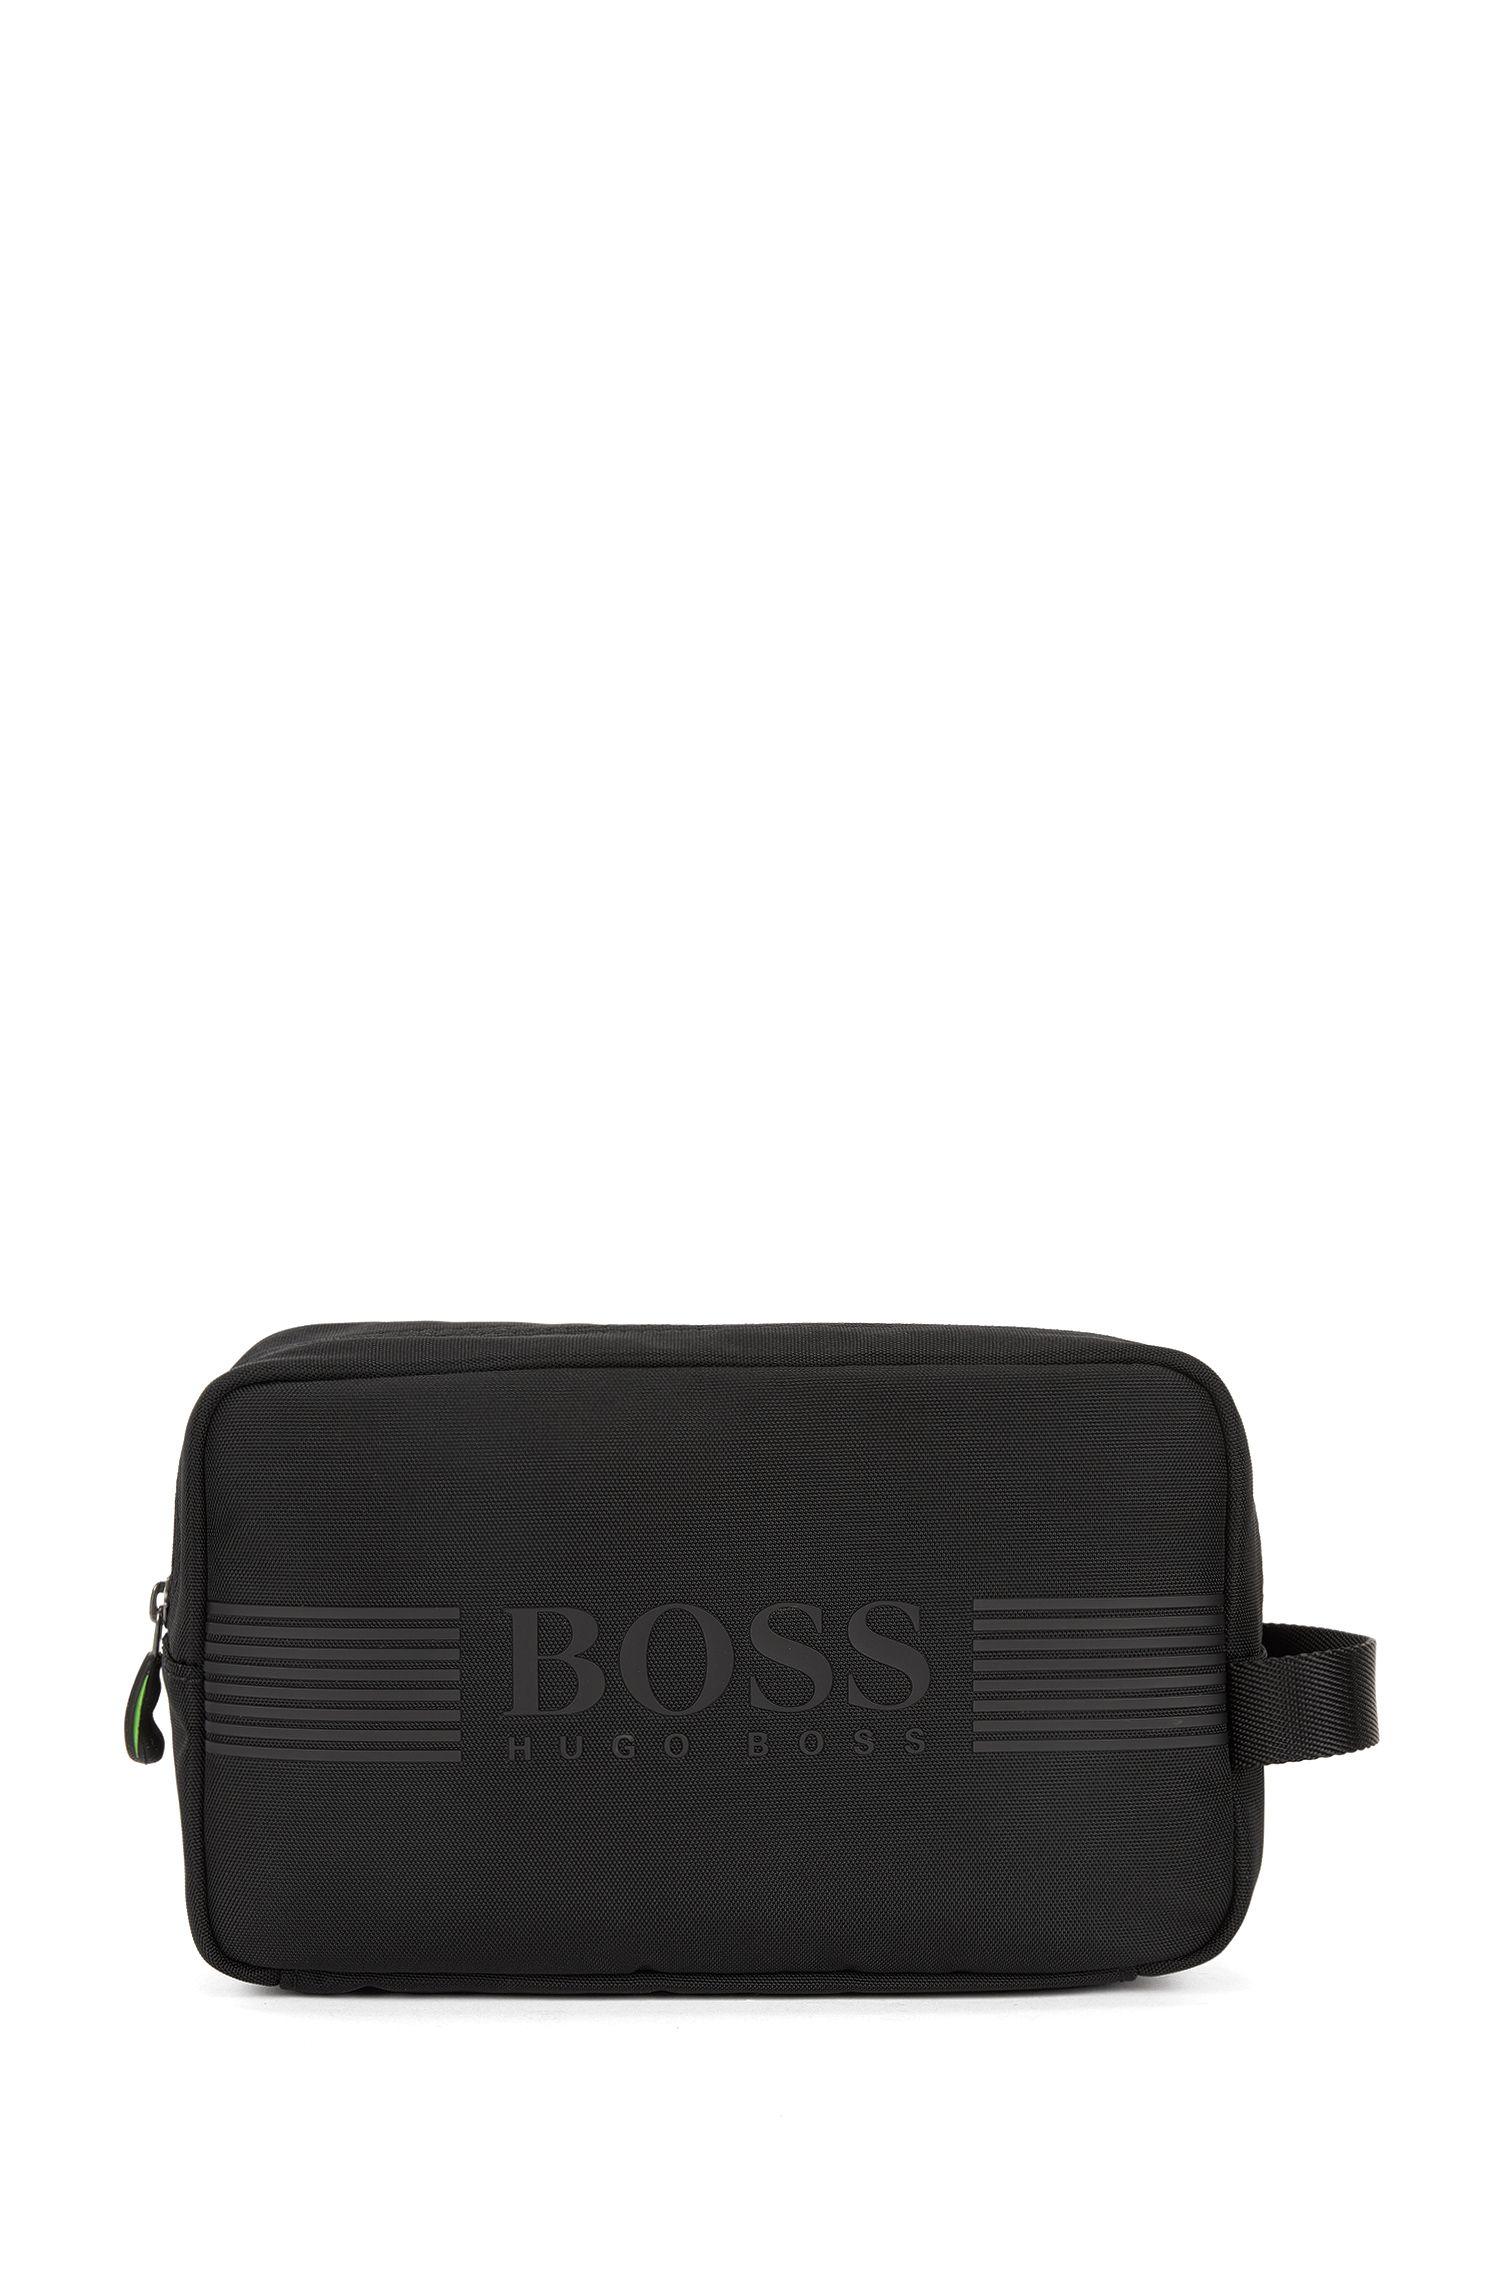 Wash bag in durable nylon, Black